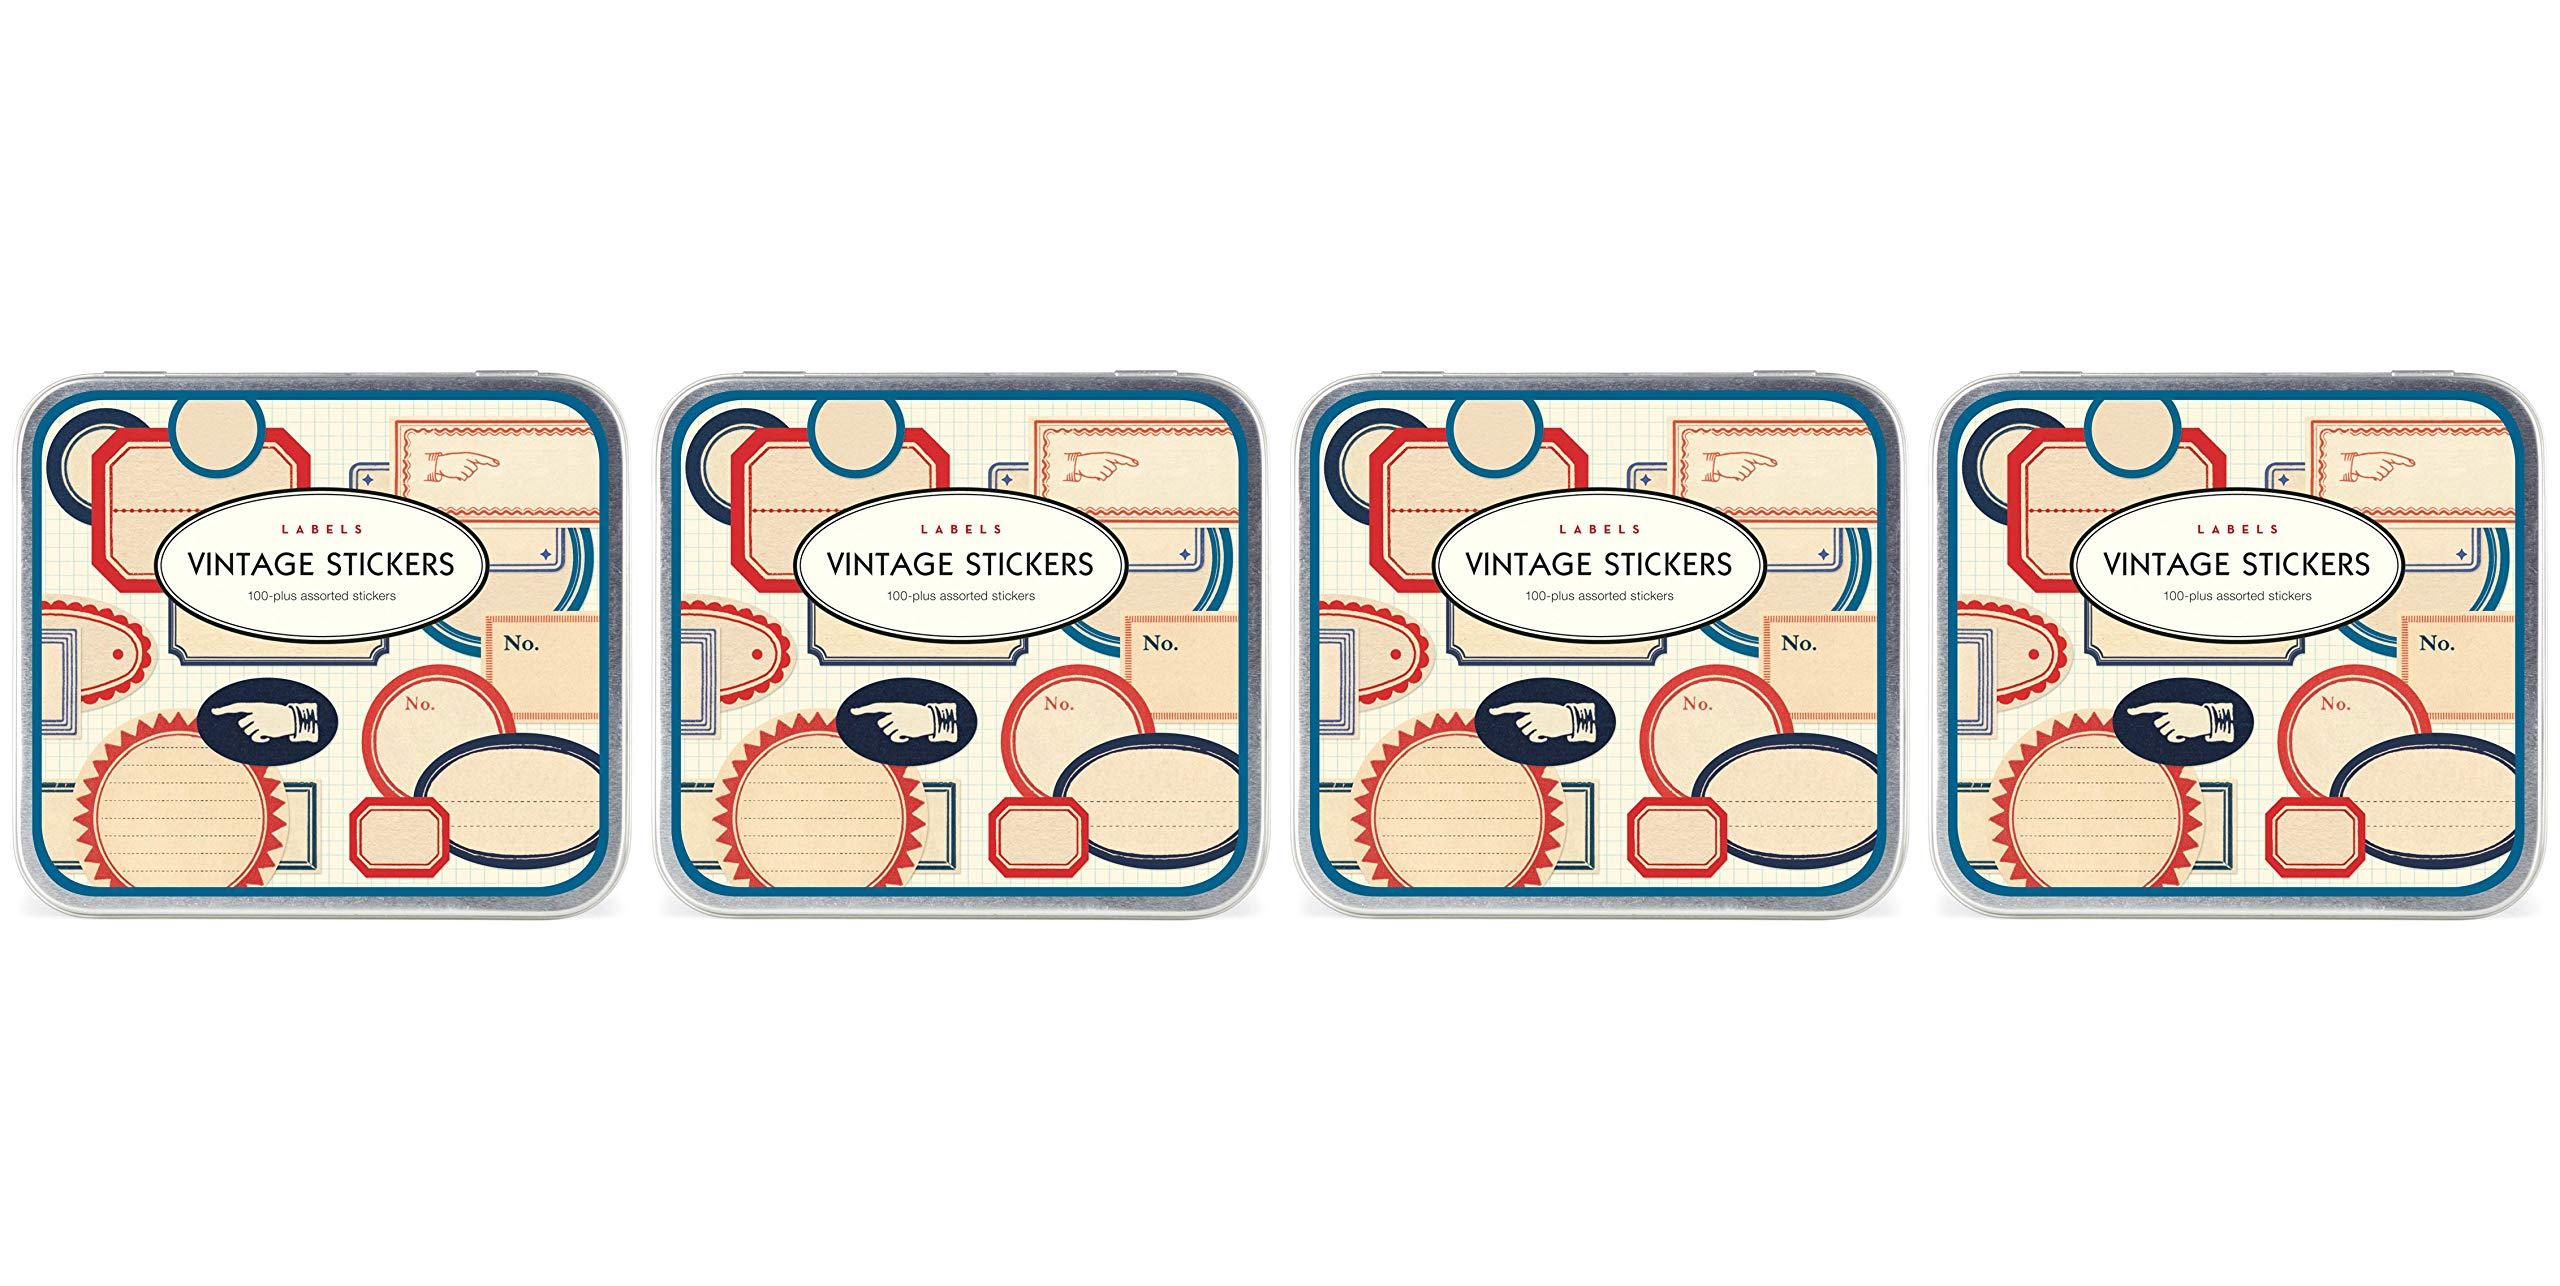 Cavallini Vintage 100 Plus Assorted Labels Stickers (Fоur Paсk)